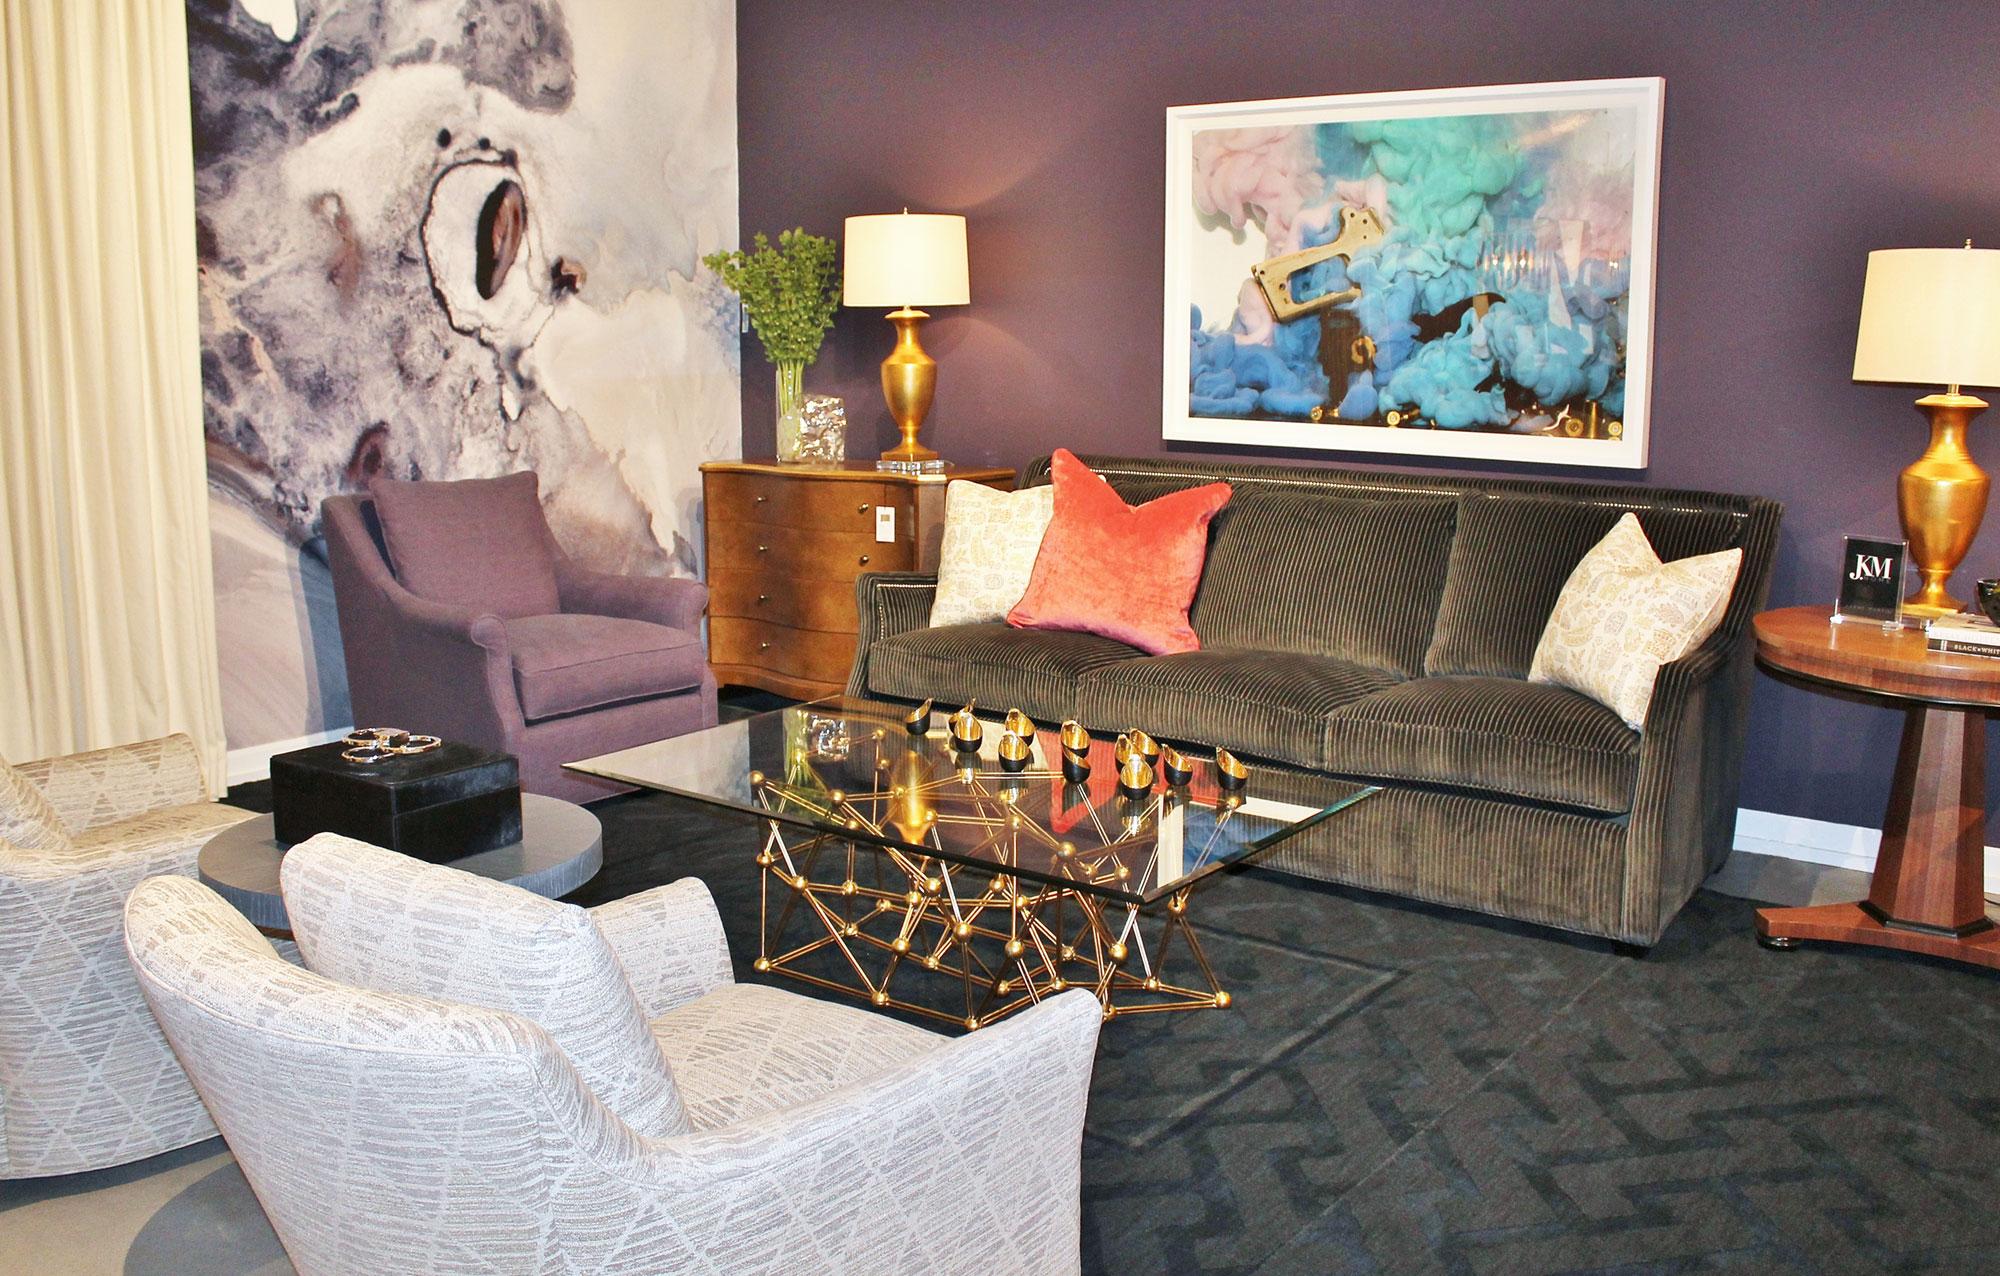 CALIBER SERIES FINE ART PRINTS CR Laine Showroom